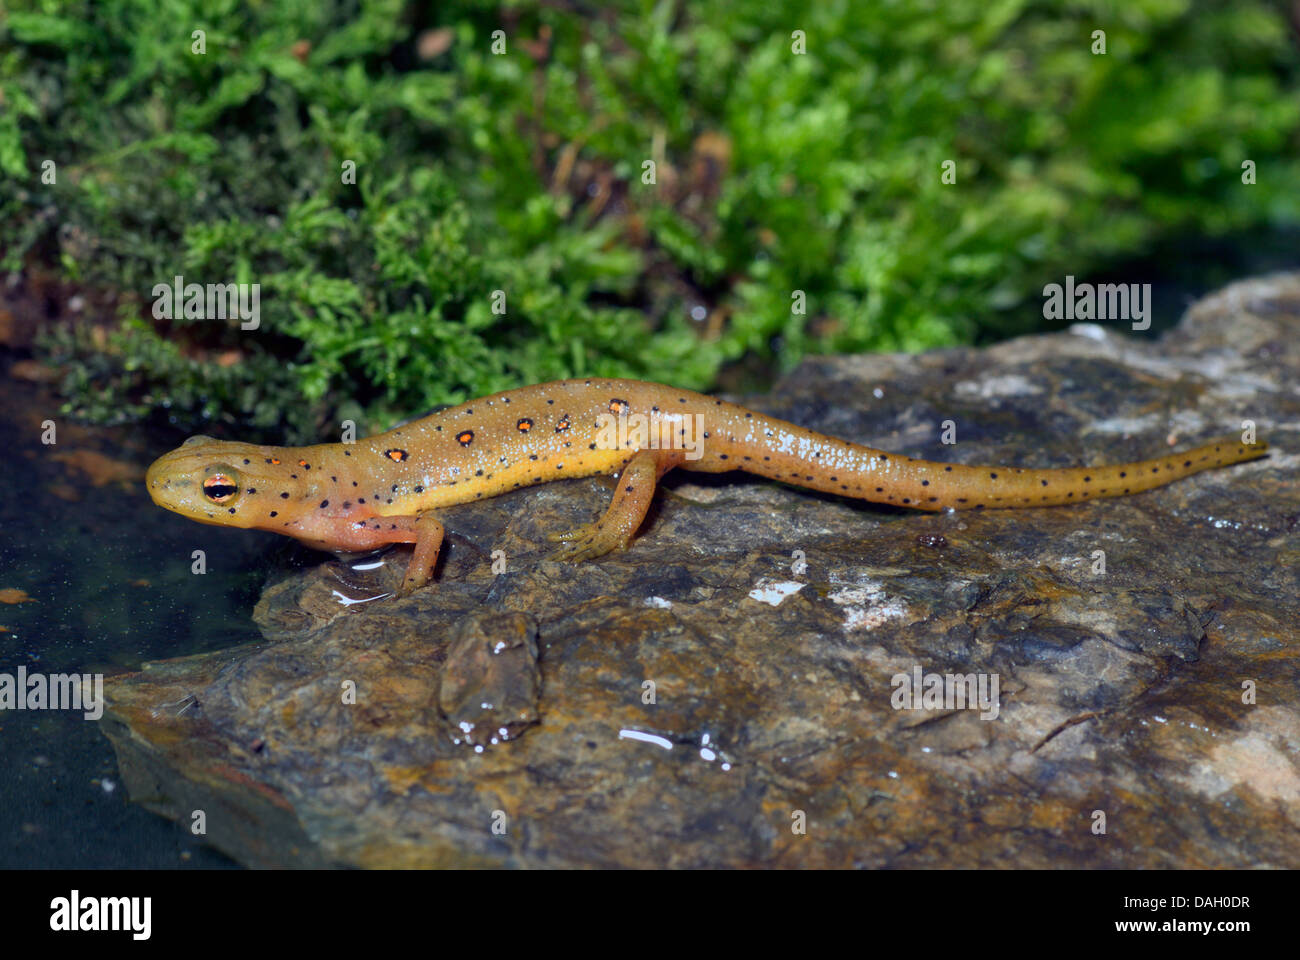 Eft, rojo, rojo-spotted newt eft, Notophthalmus viridescens newt (oriental), en una piedra Foto de stock